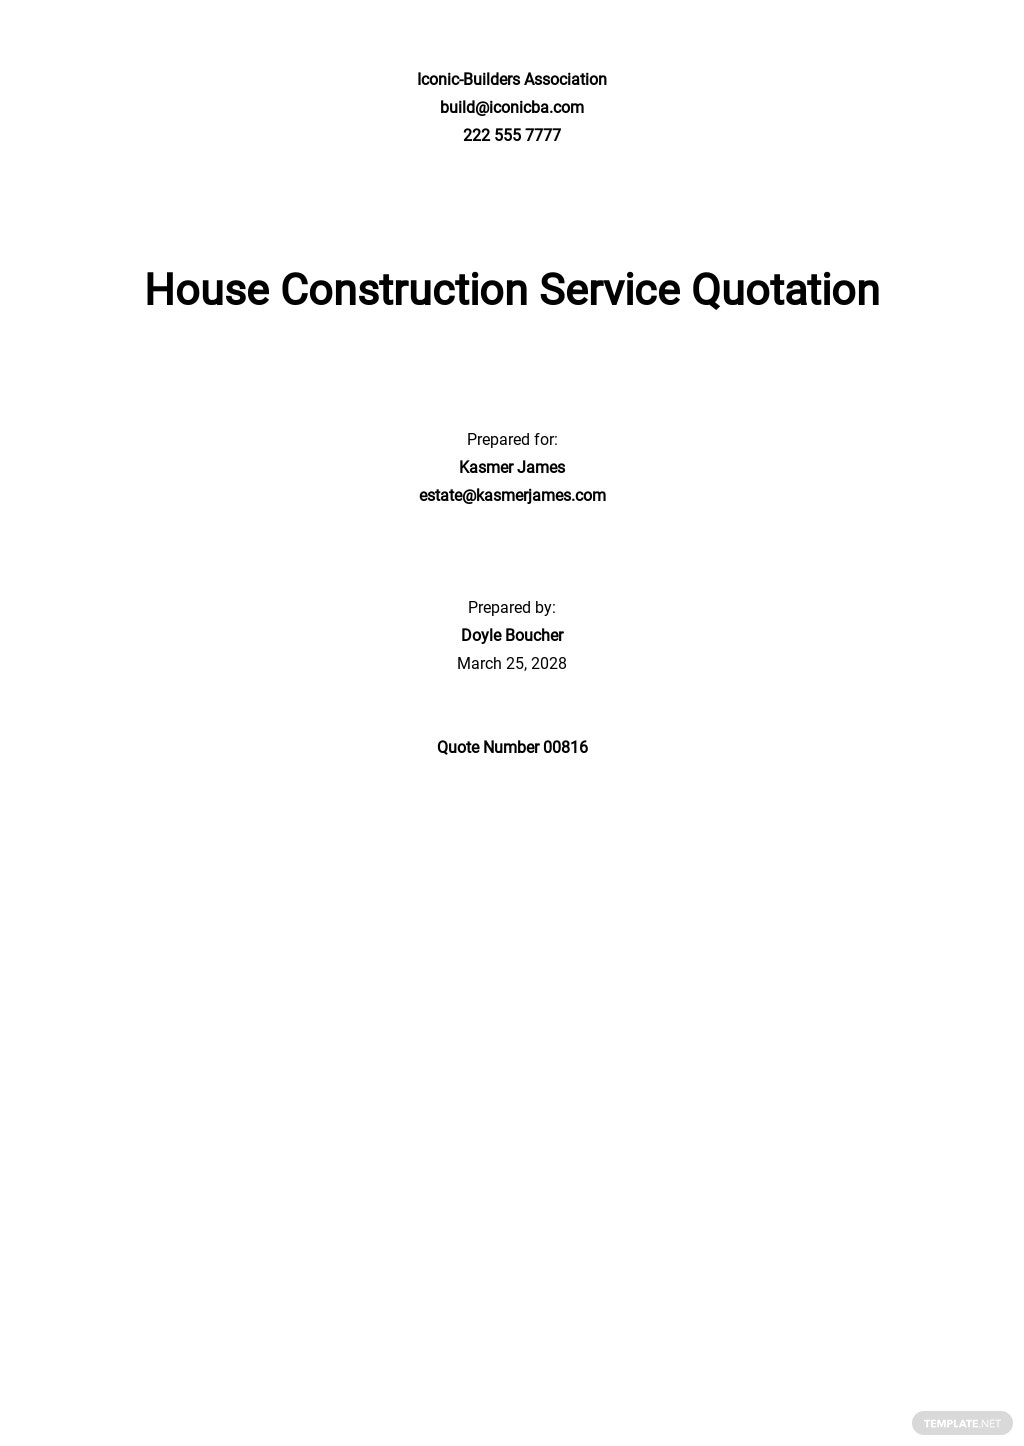 House Construction Quotation Template